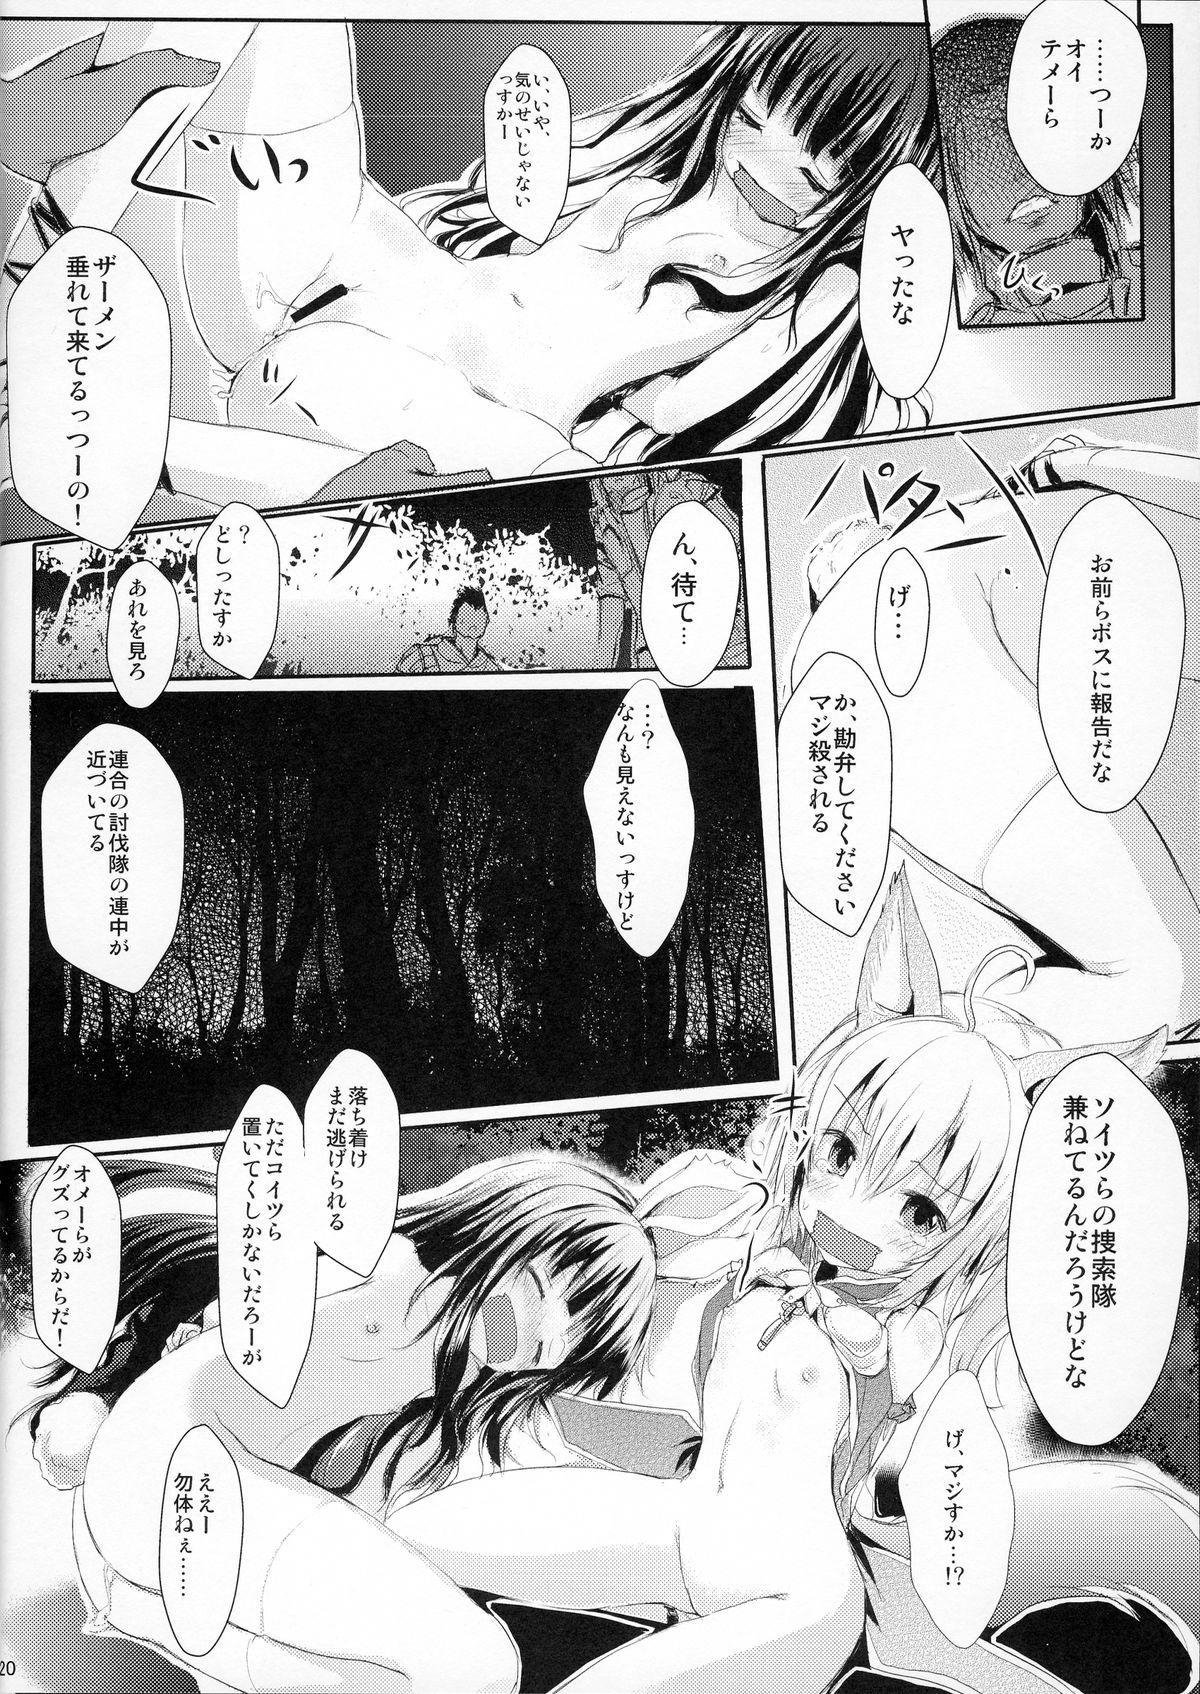 [Mirukomi (PRIMIL)] Human wa Erin-chan ni Hidoi Koto Shitai yo ne - ELIN's the best - (TERA The Exiled Realm of Arborea) 19